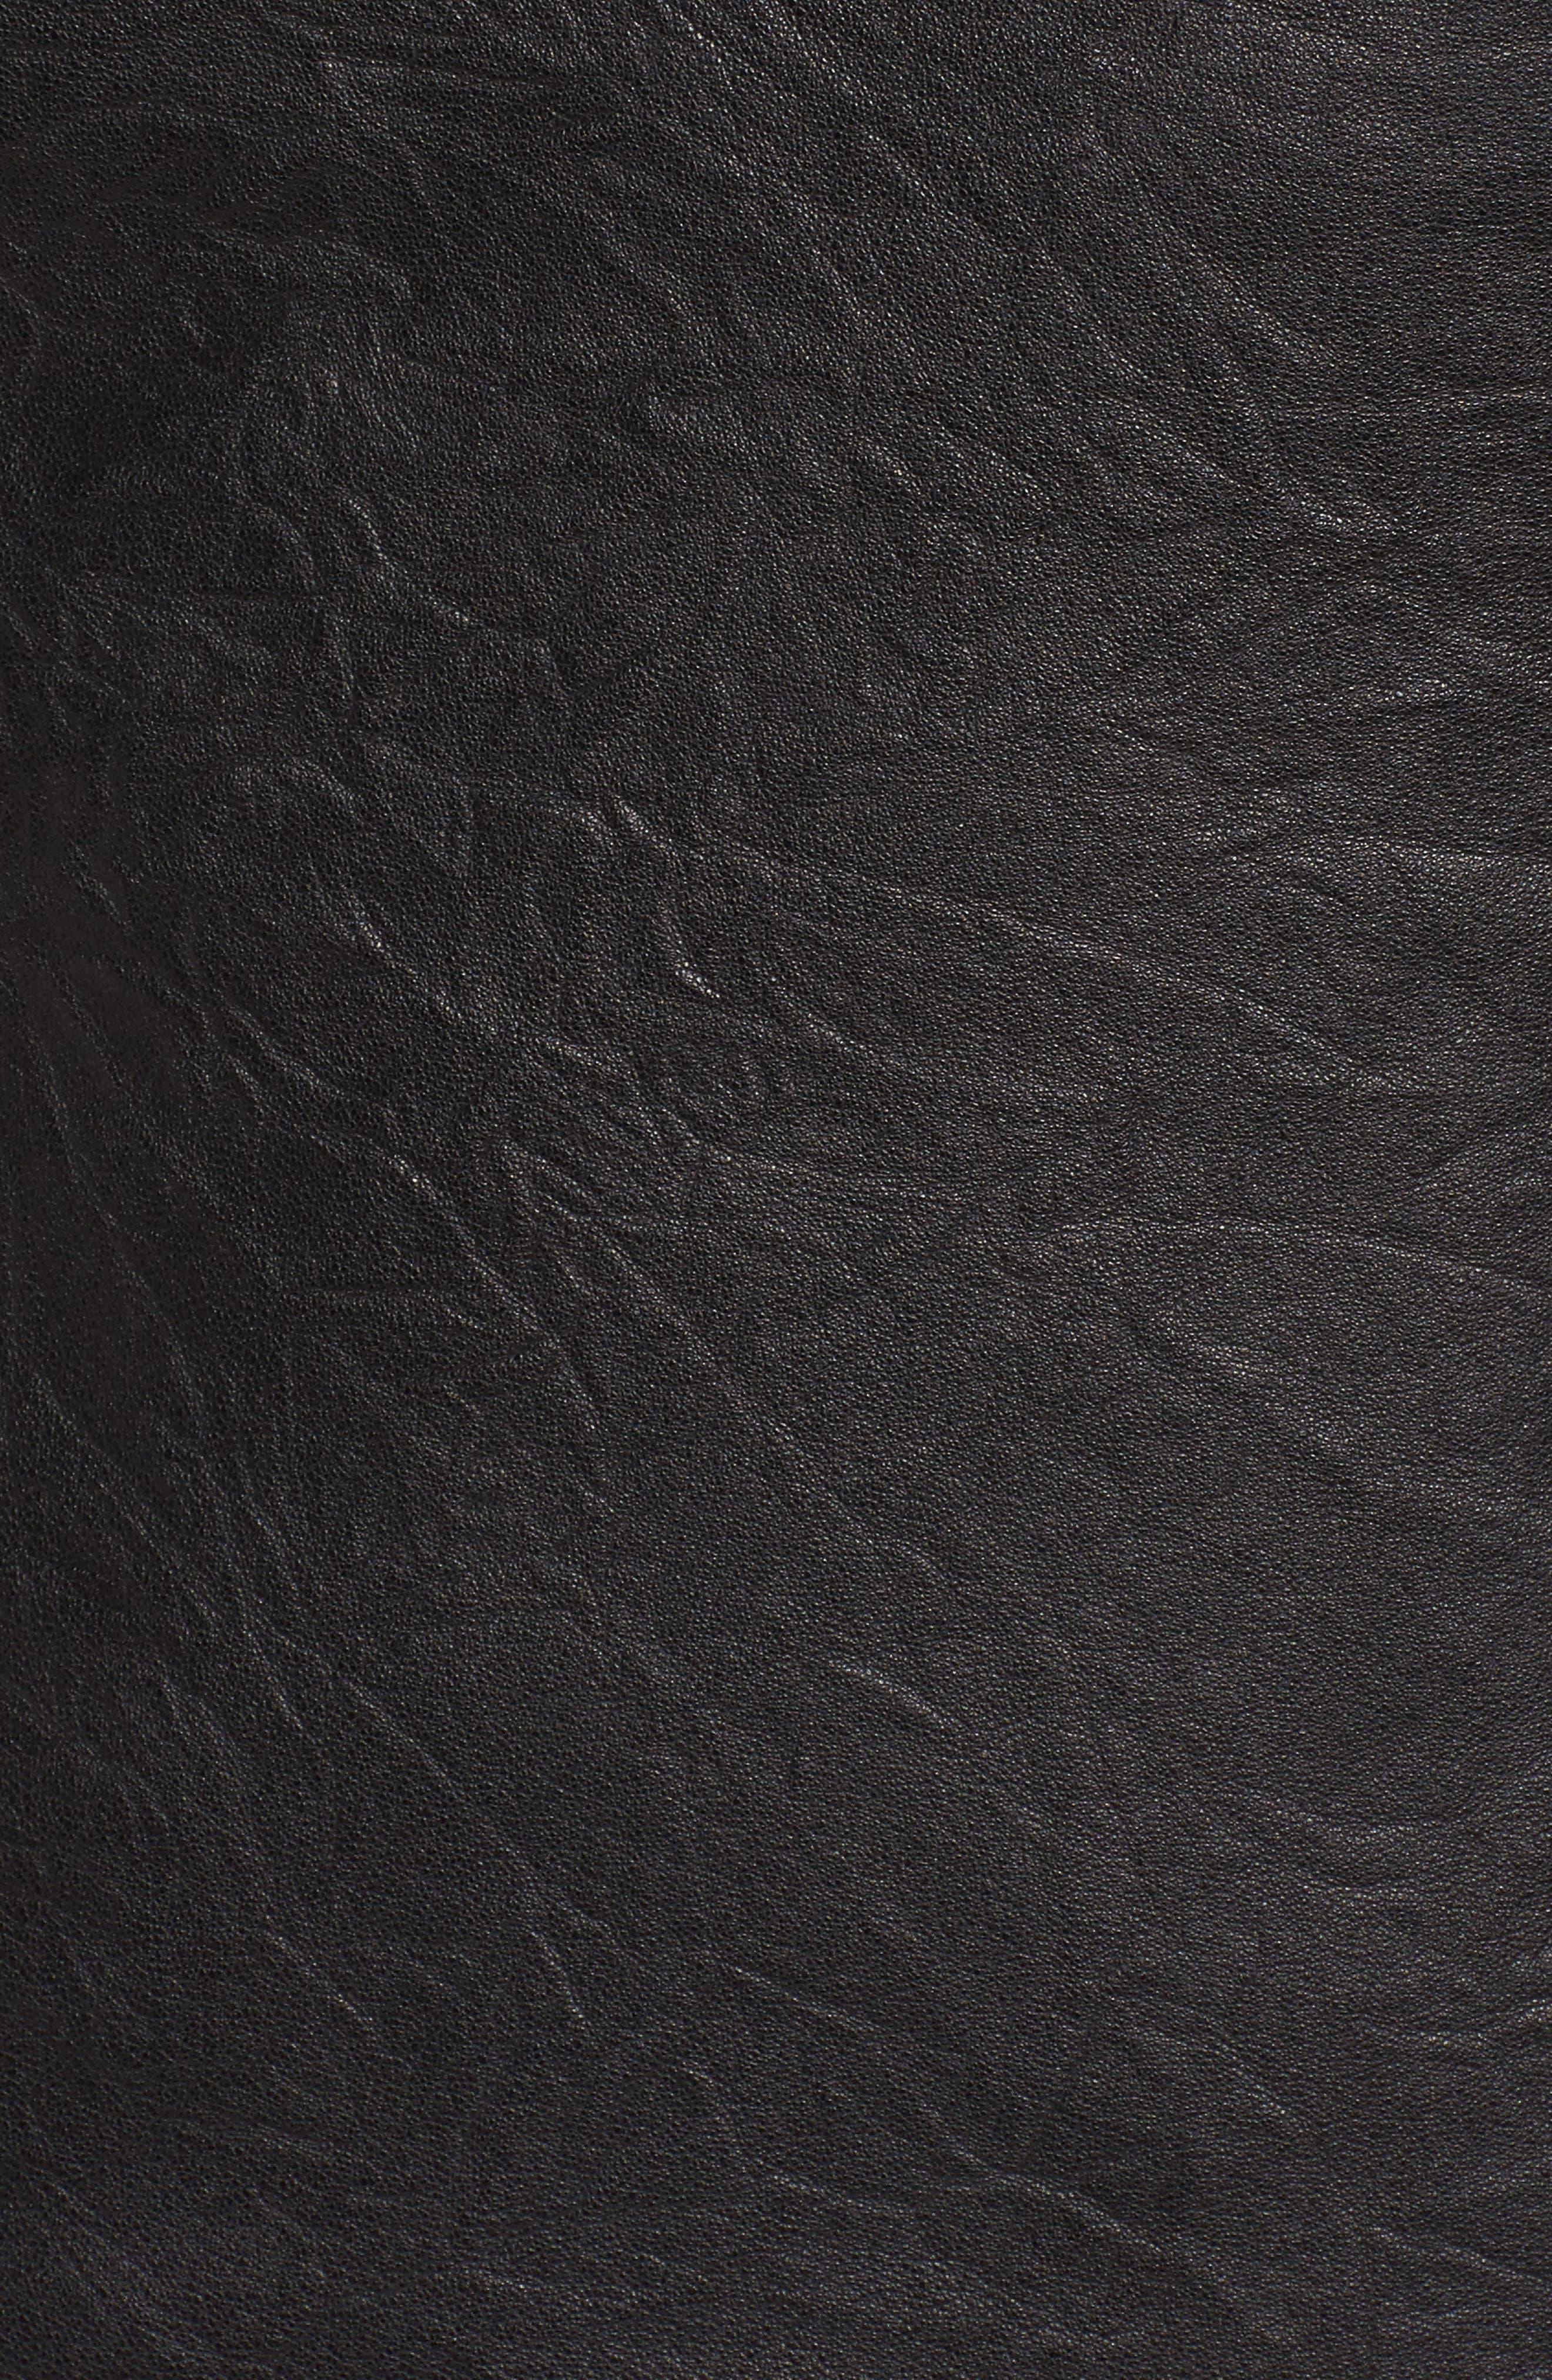 Aimes Leather Jacket,                             Alternate thumbnail 5, color,